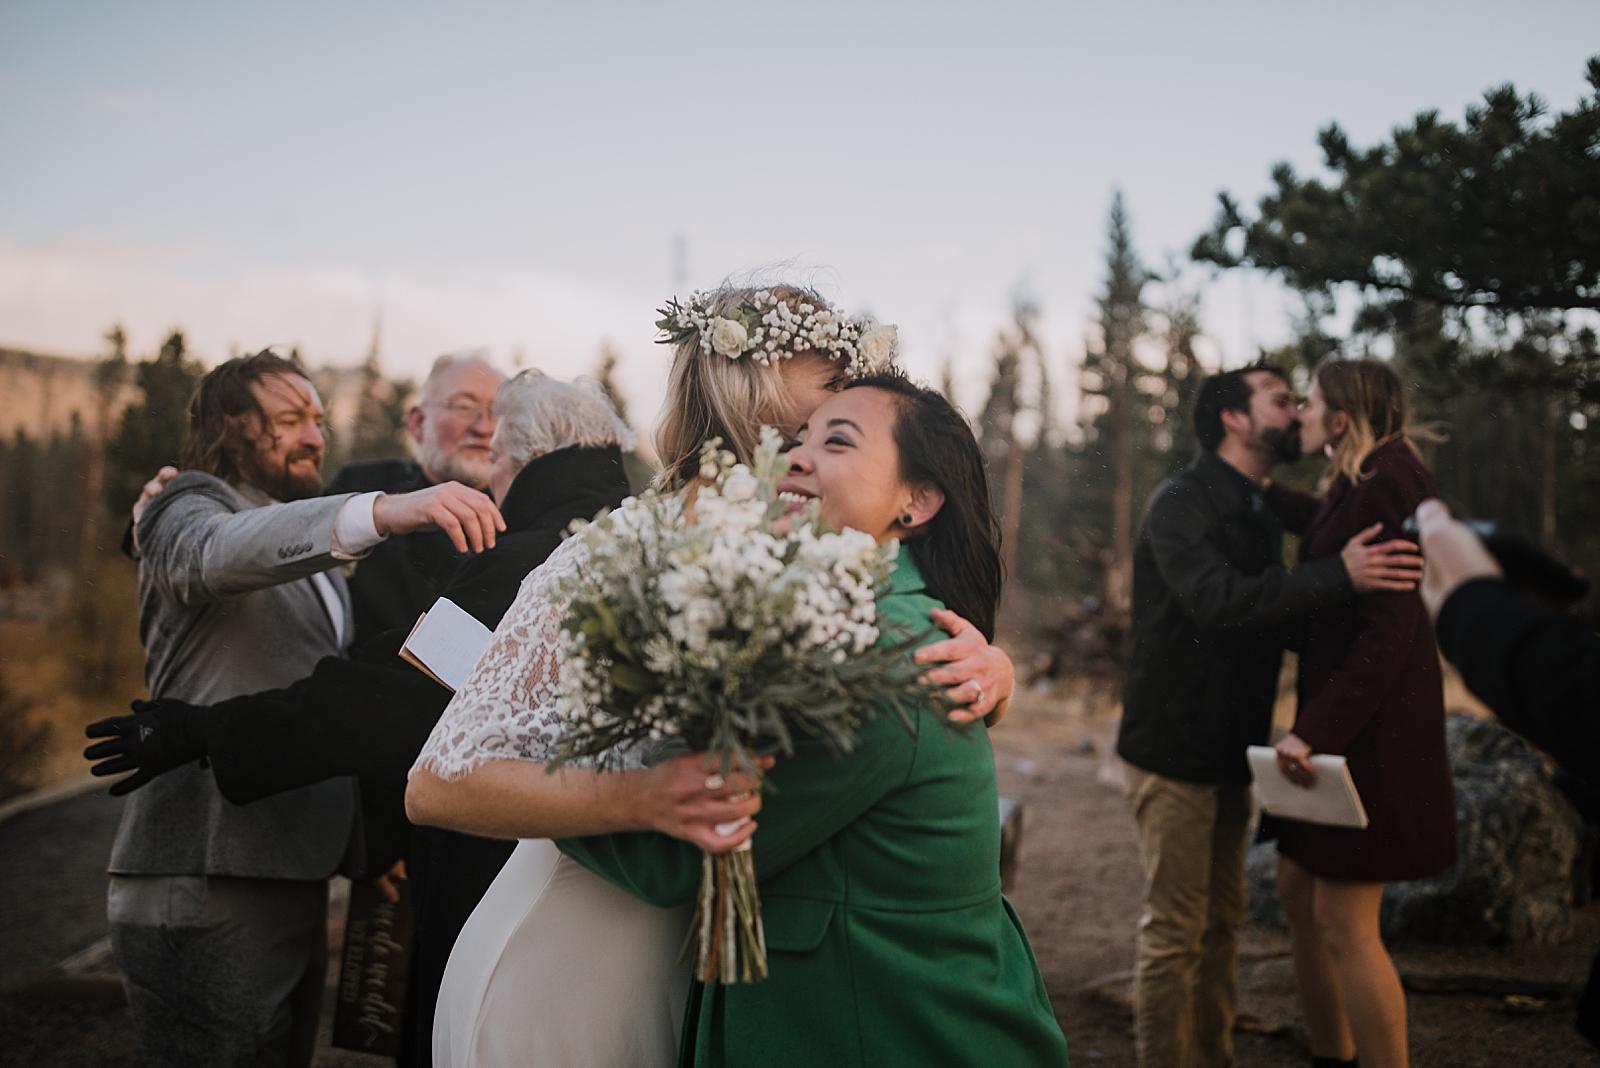 elopement reception, sprague lake dock elopement, sunrise elopement, colorado elopement, sprague lake elopement, rocky mountain national park elopement, adventurous colorado hiking elopement